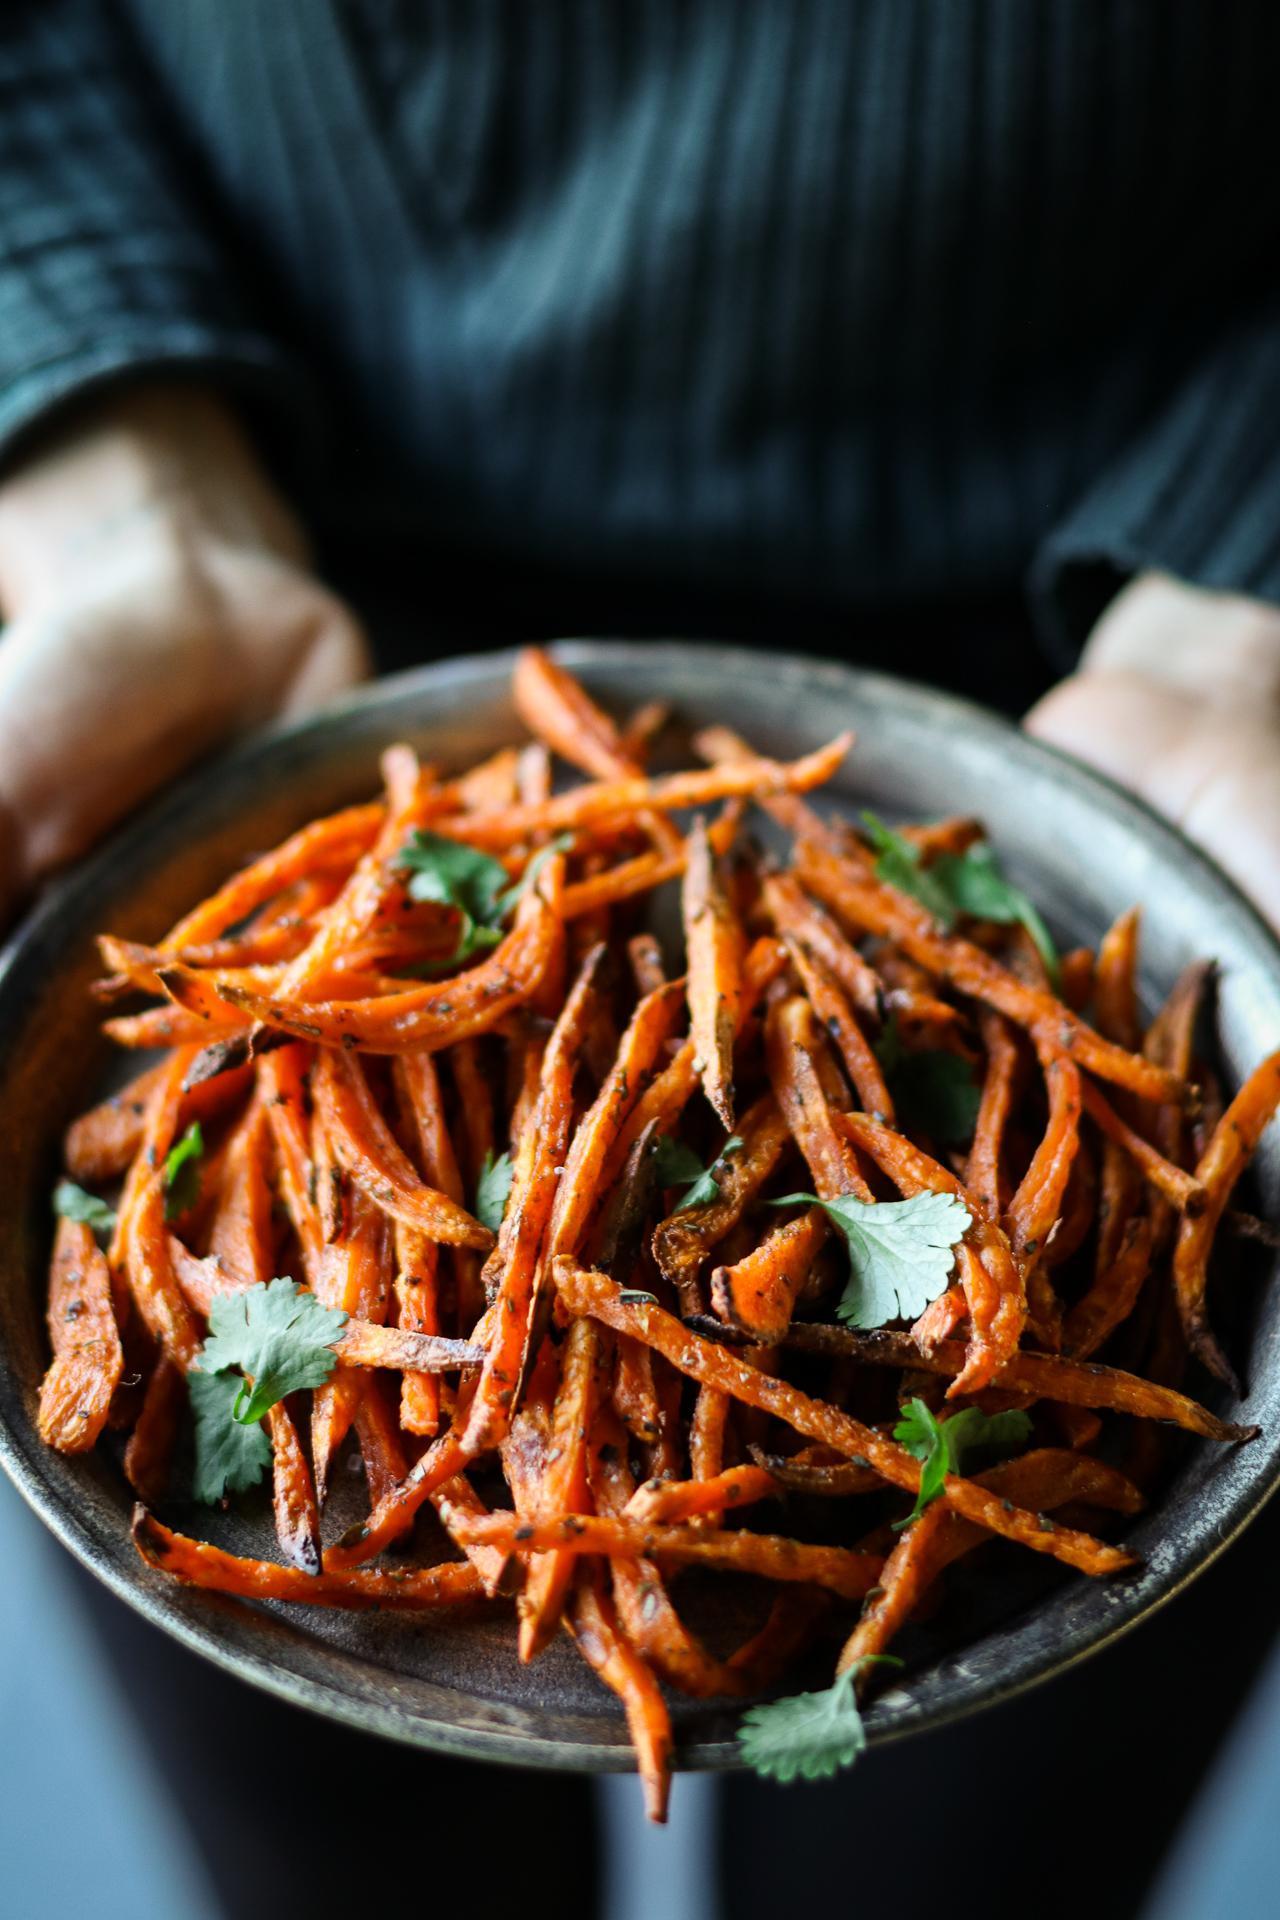 Main image of Crispy Oven-Roasted Sweet Potato Fries